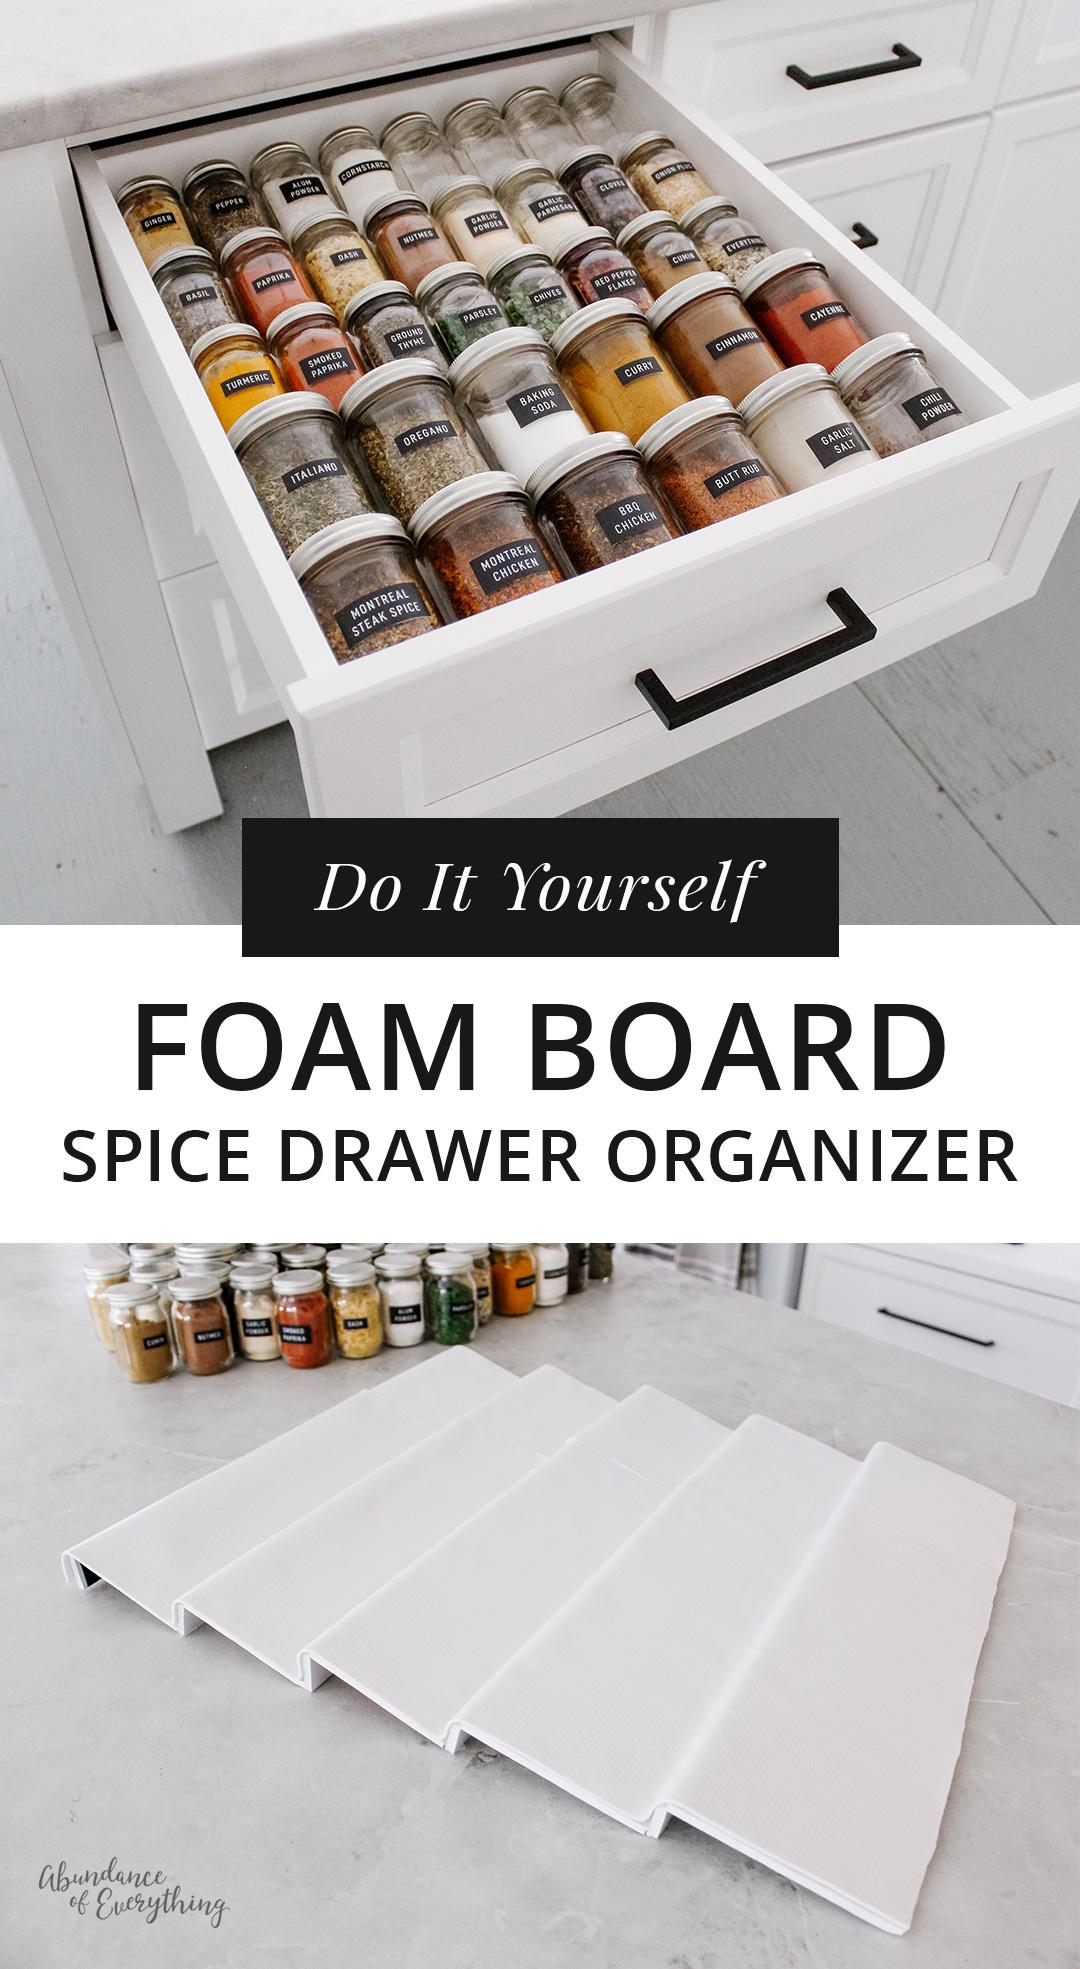 Do it yourself: Foam Board Spice Drawer Organizer